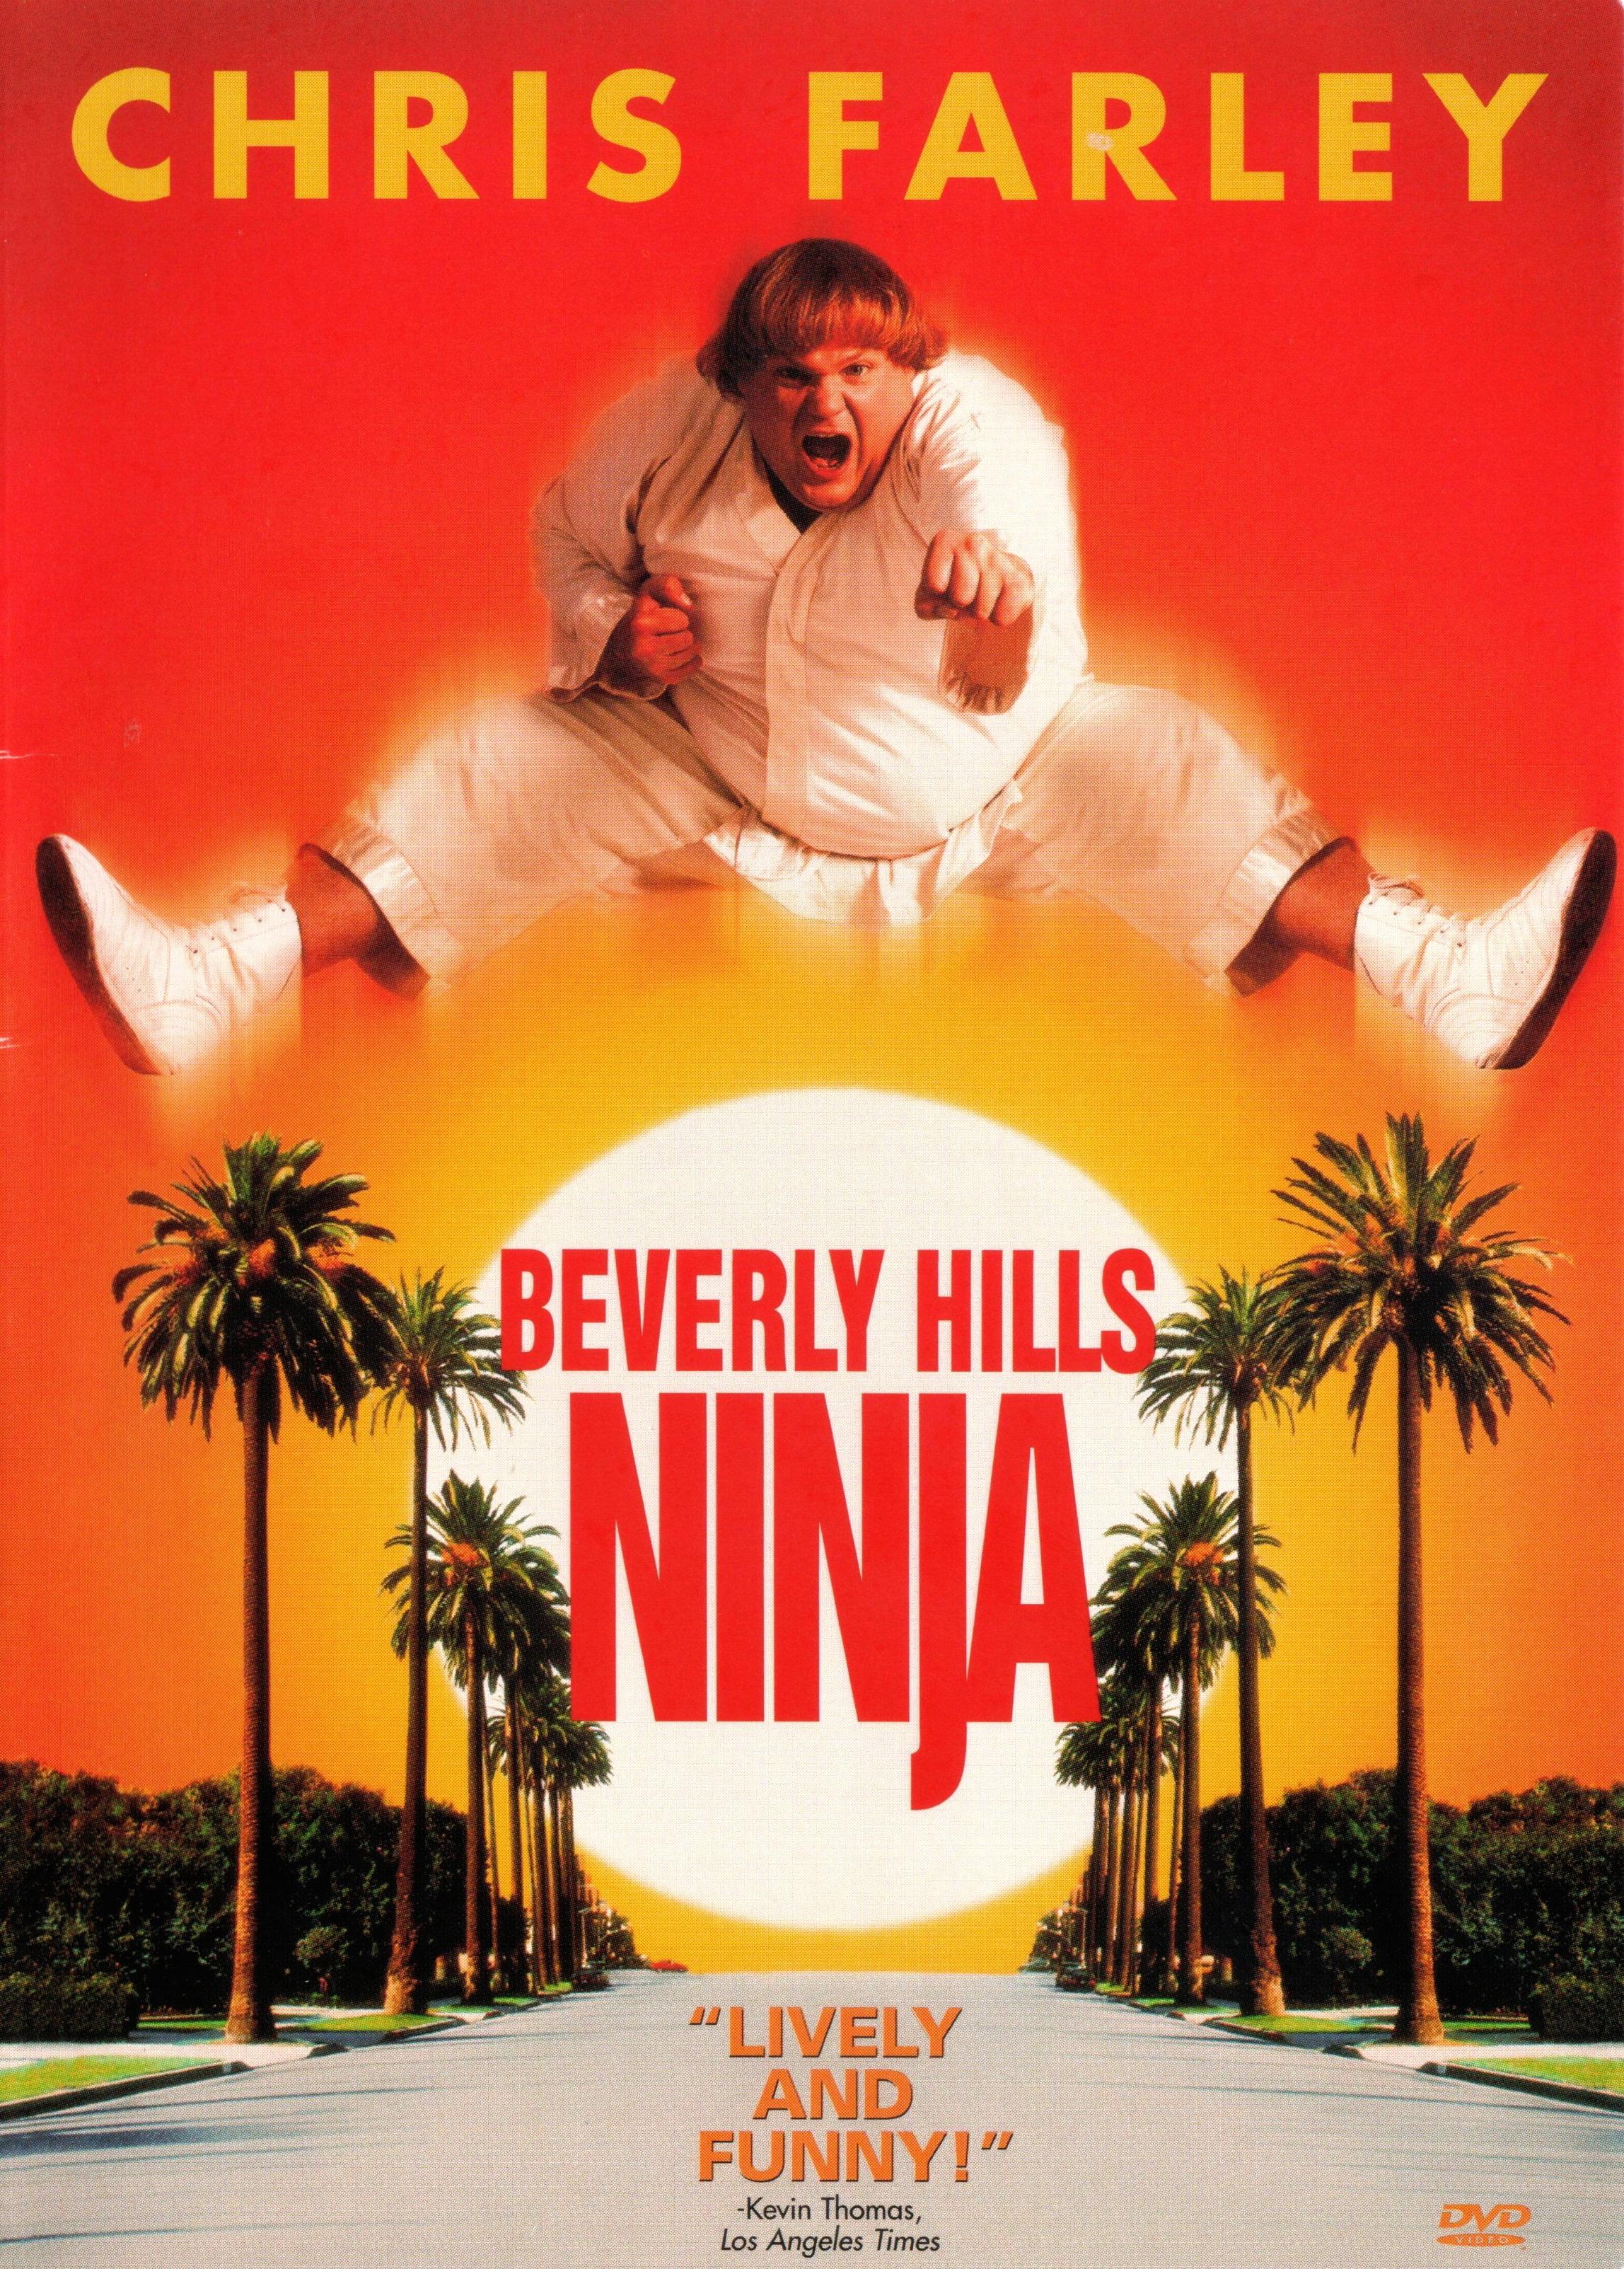 1997-Beverly Hills Ninja.jpg